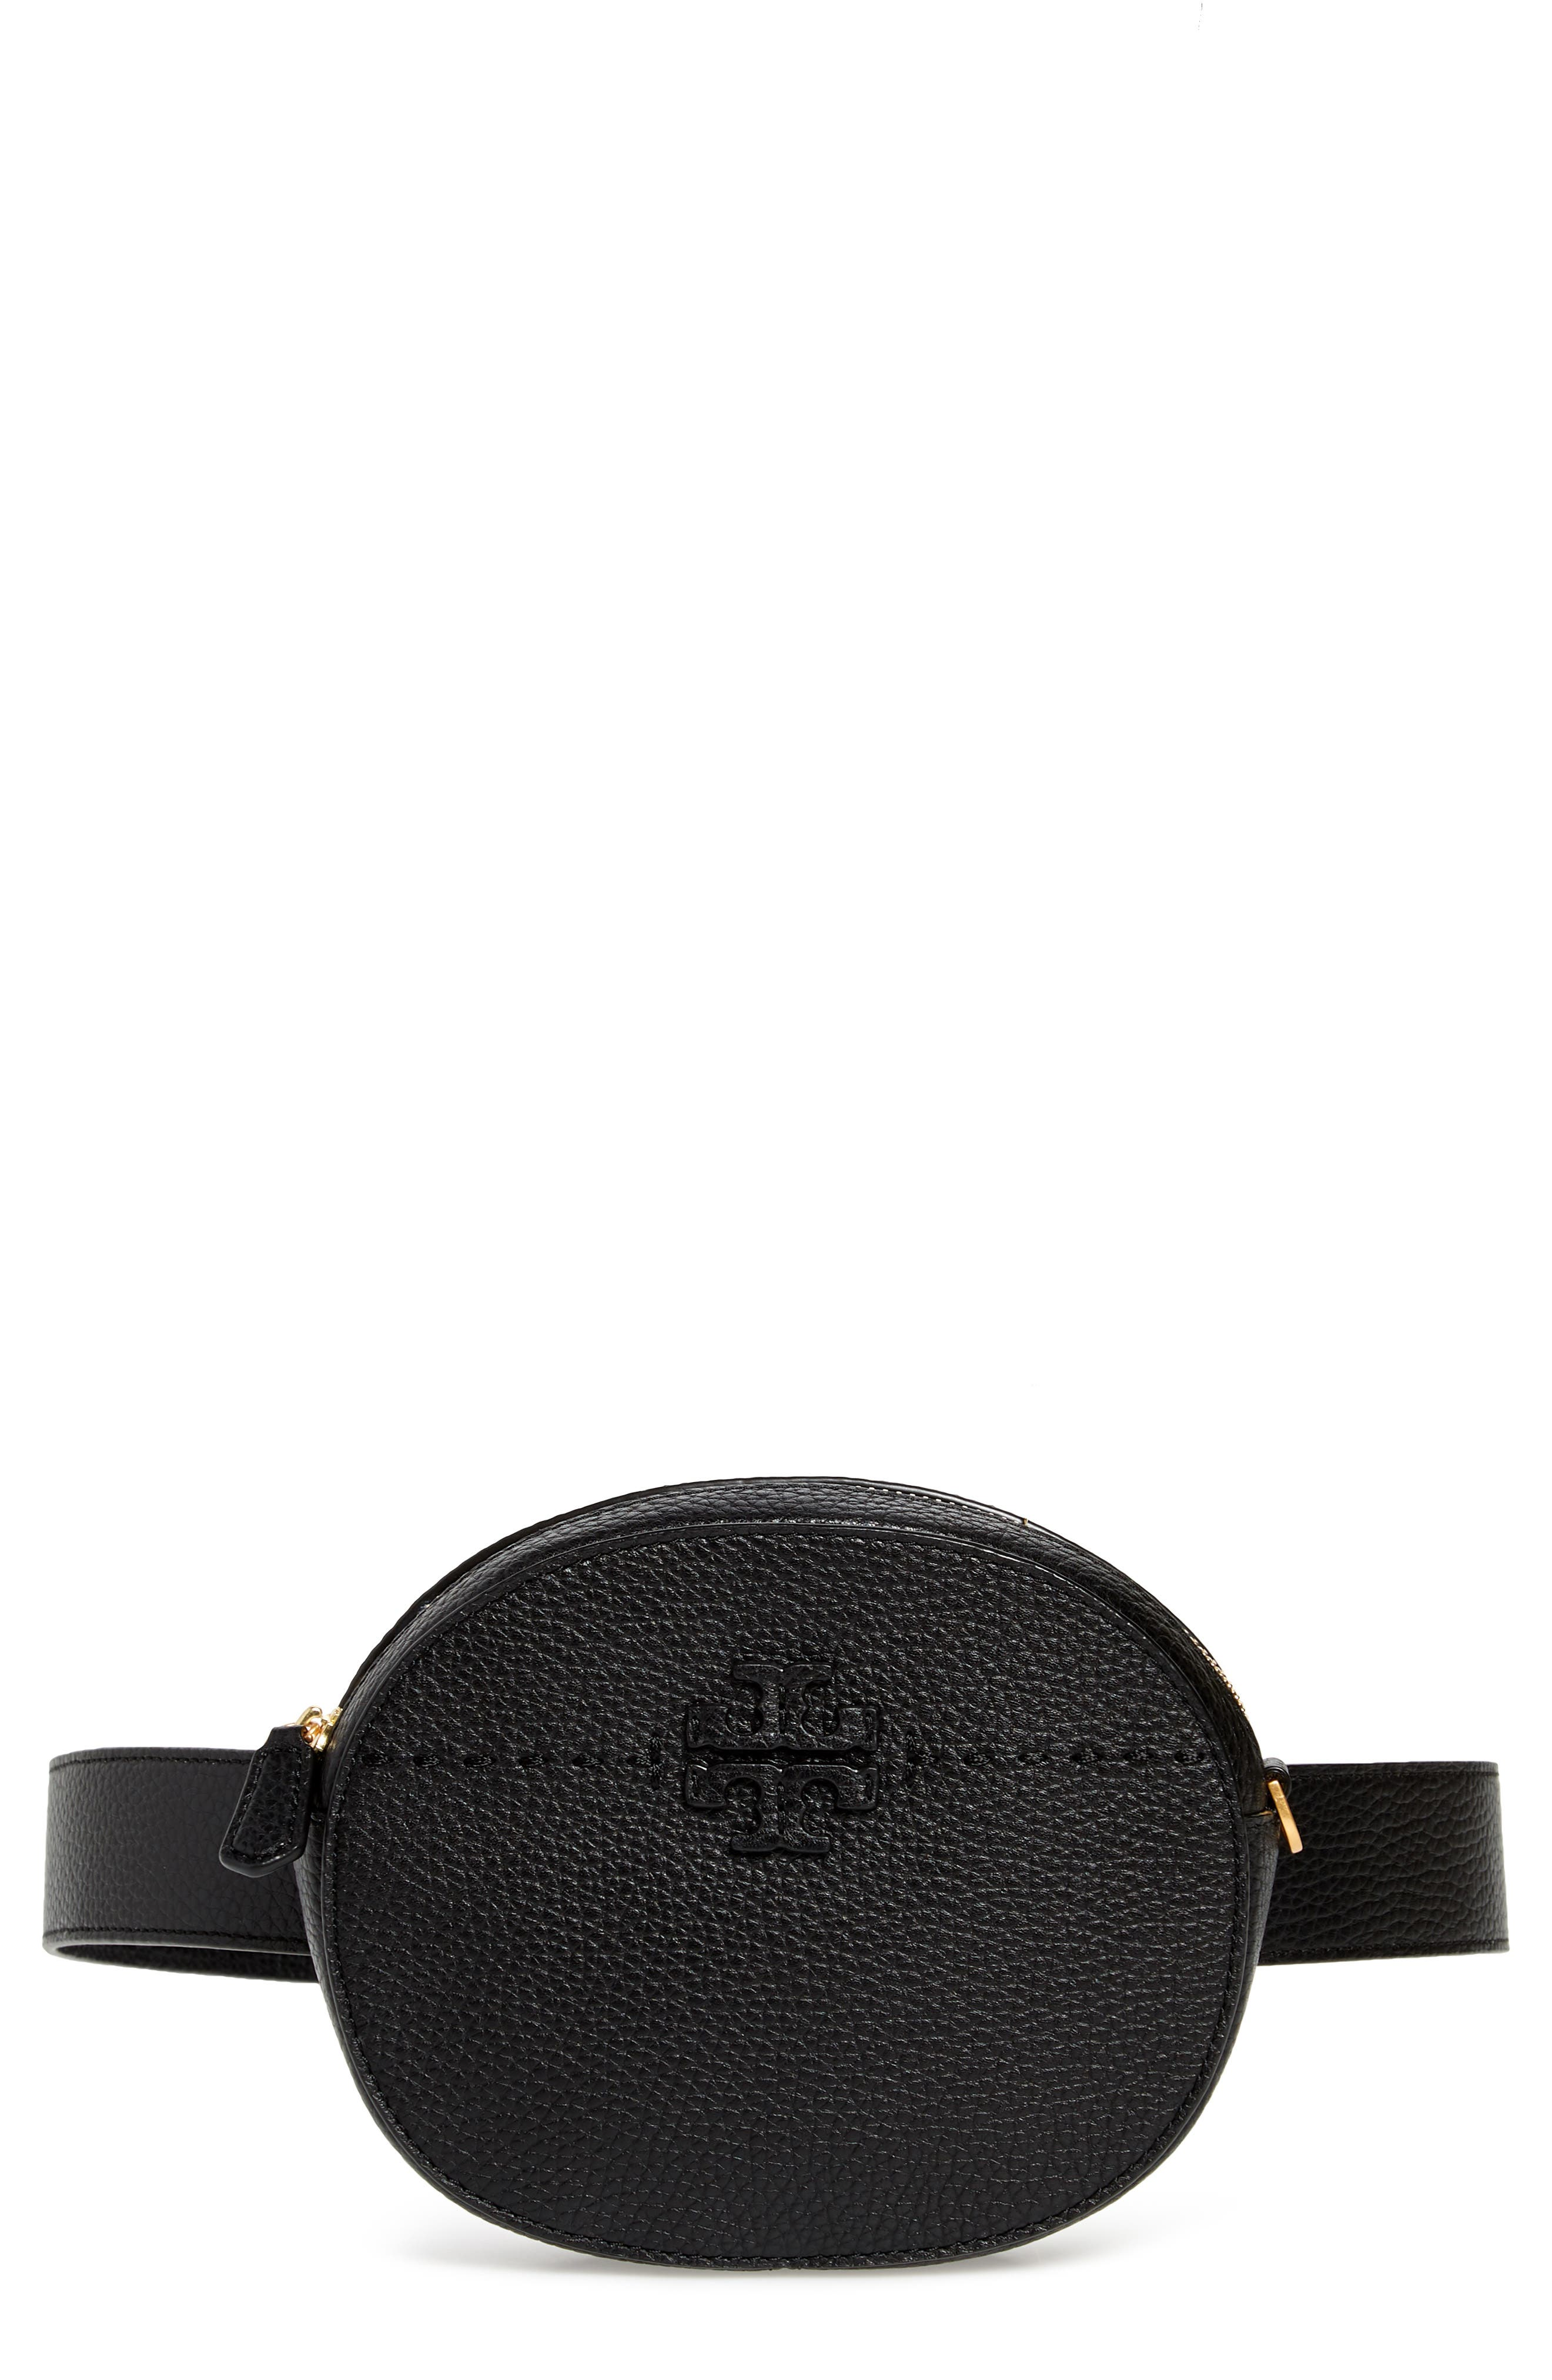 McGraw Leather Belt/Crossbody Bag,                             Main thumbnail 1, color,                             001